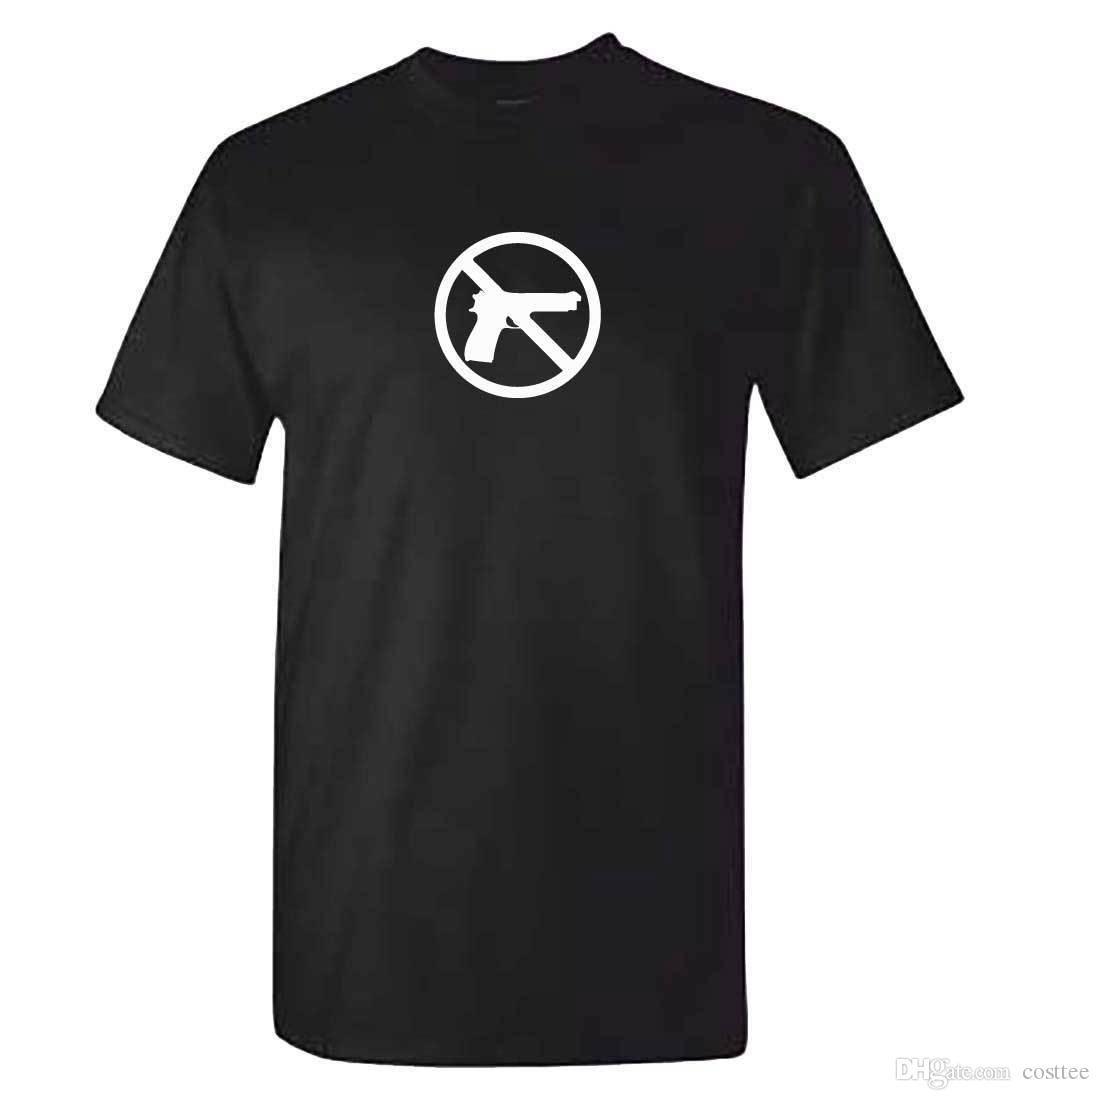 Grosshandel Anti Guns T Shirt Anti Gun T Shirt Donald Trump Protest